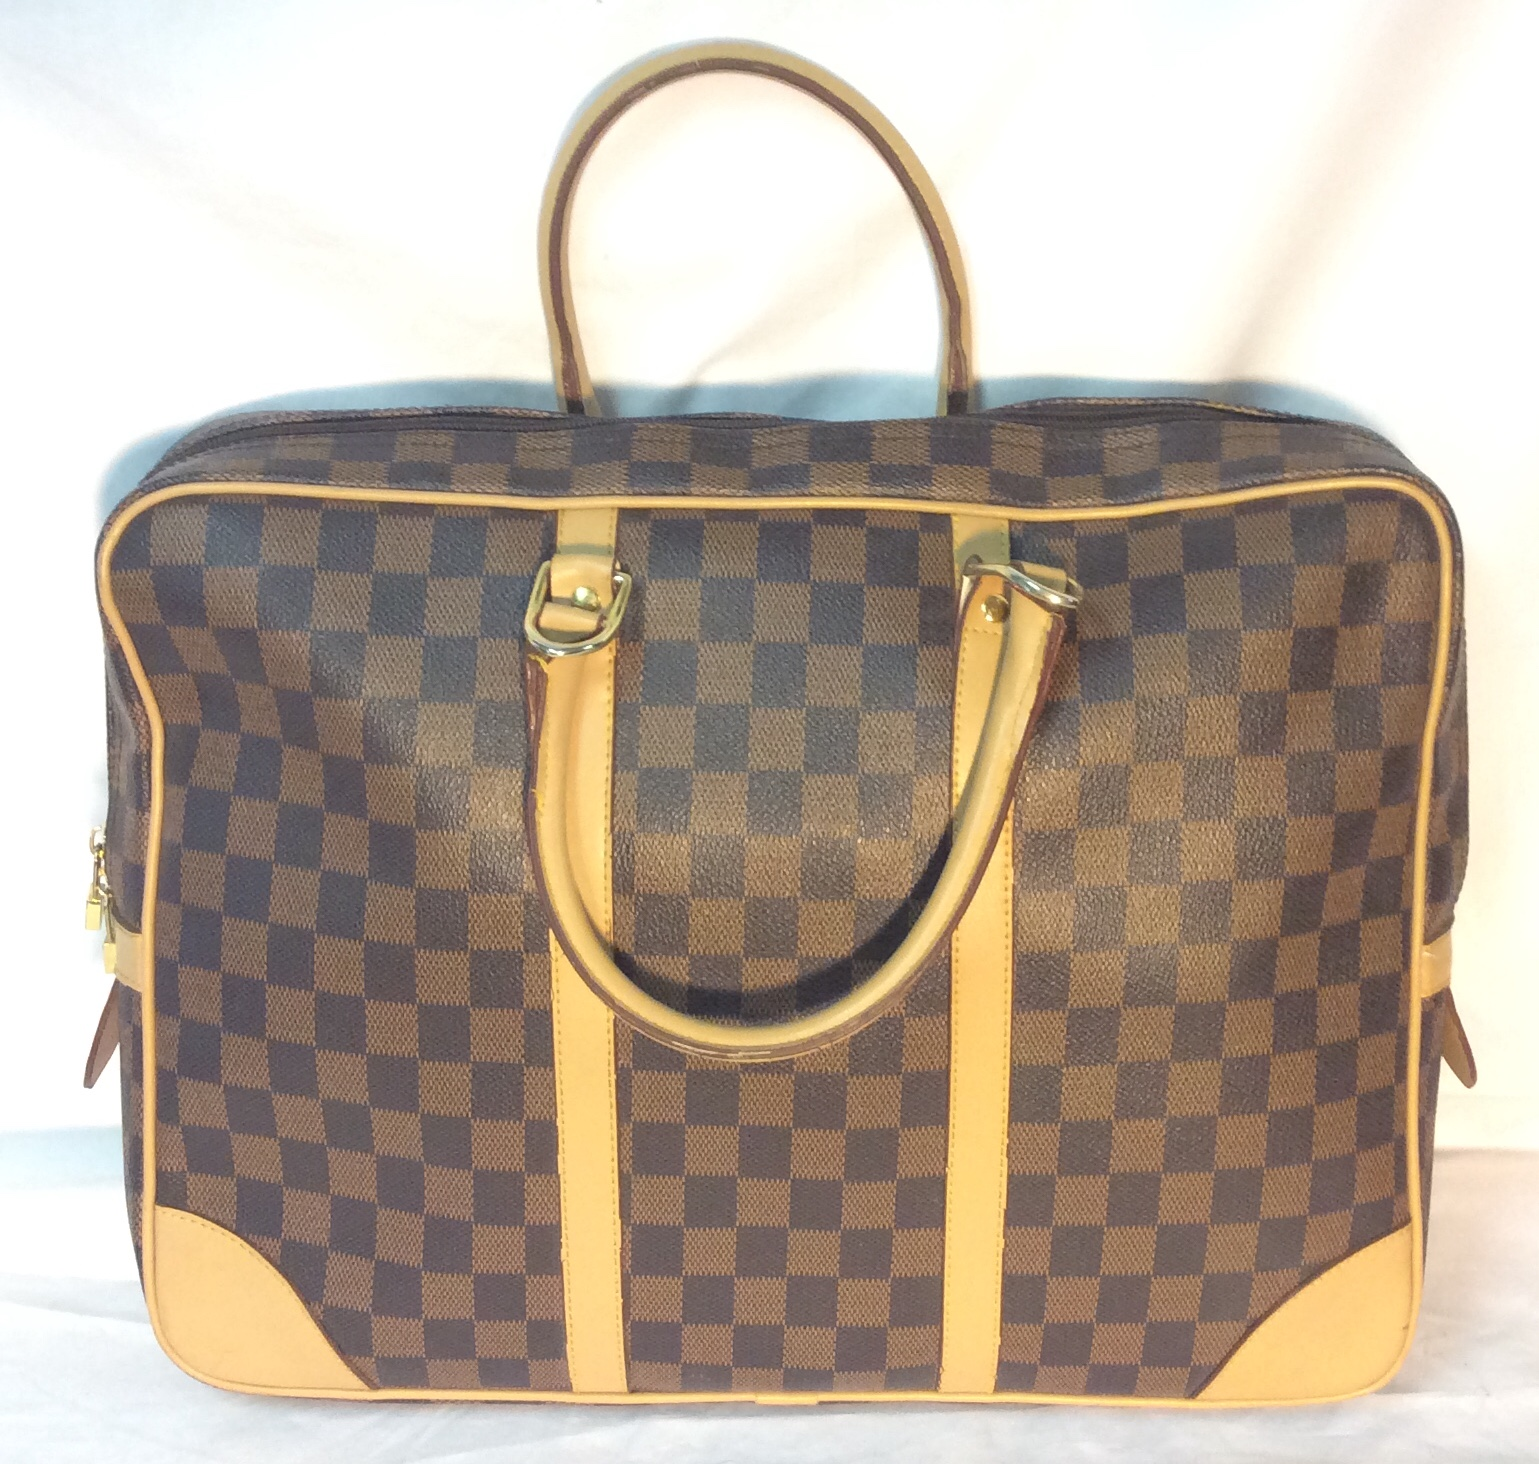 Brown checkered plastic travel bag